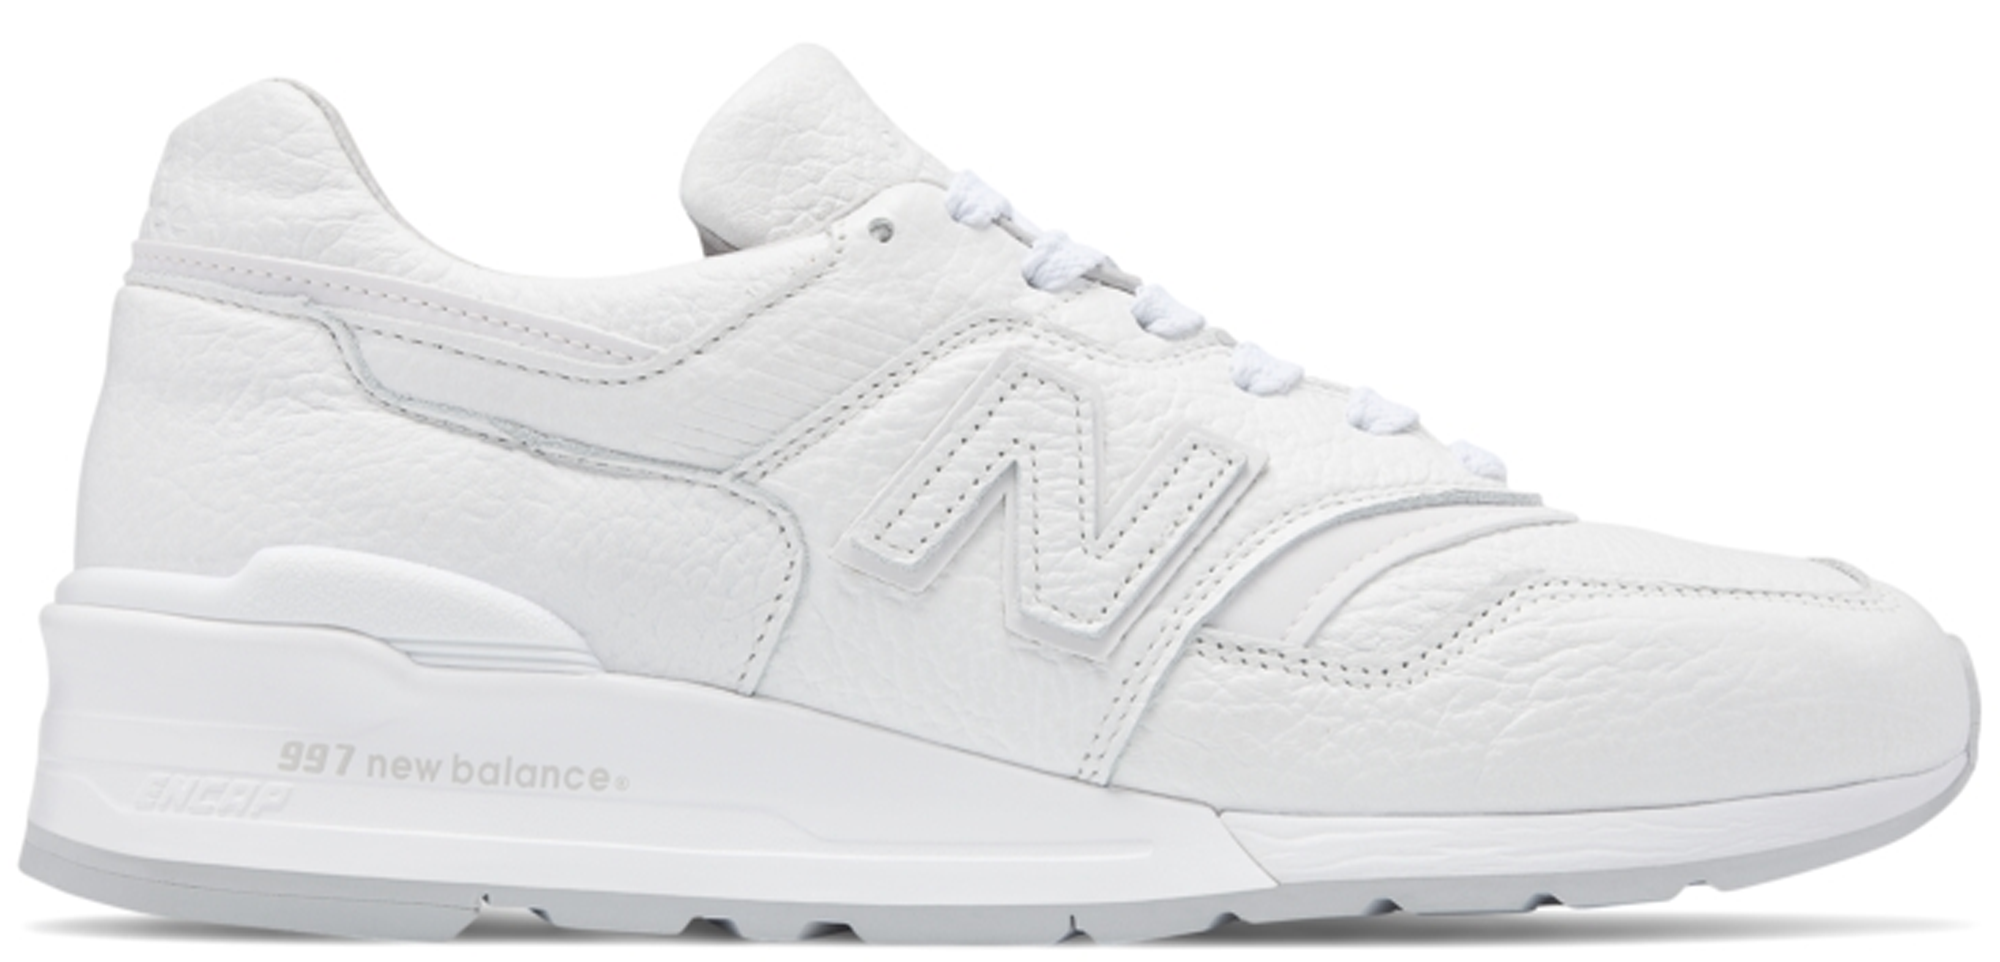 new balance 997 bison white